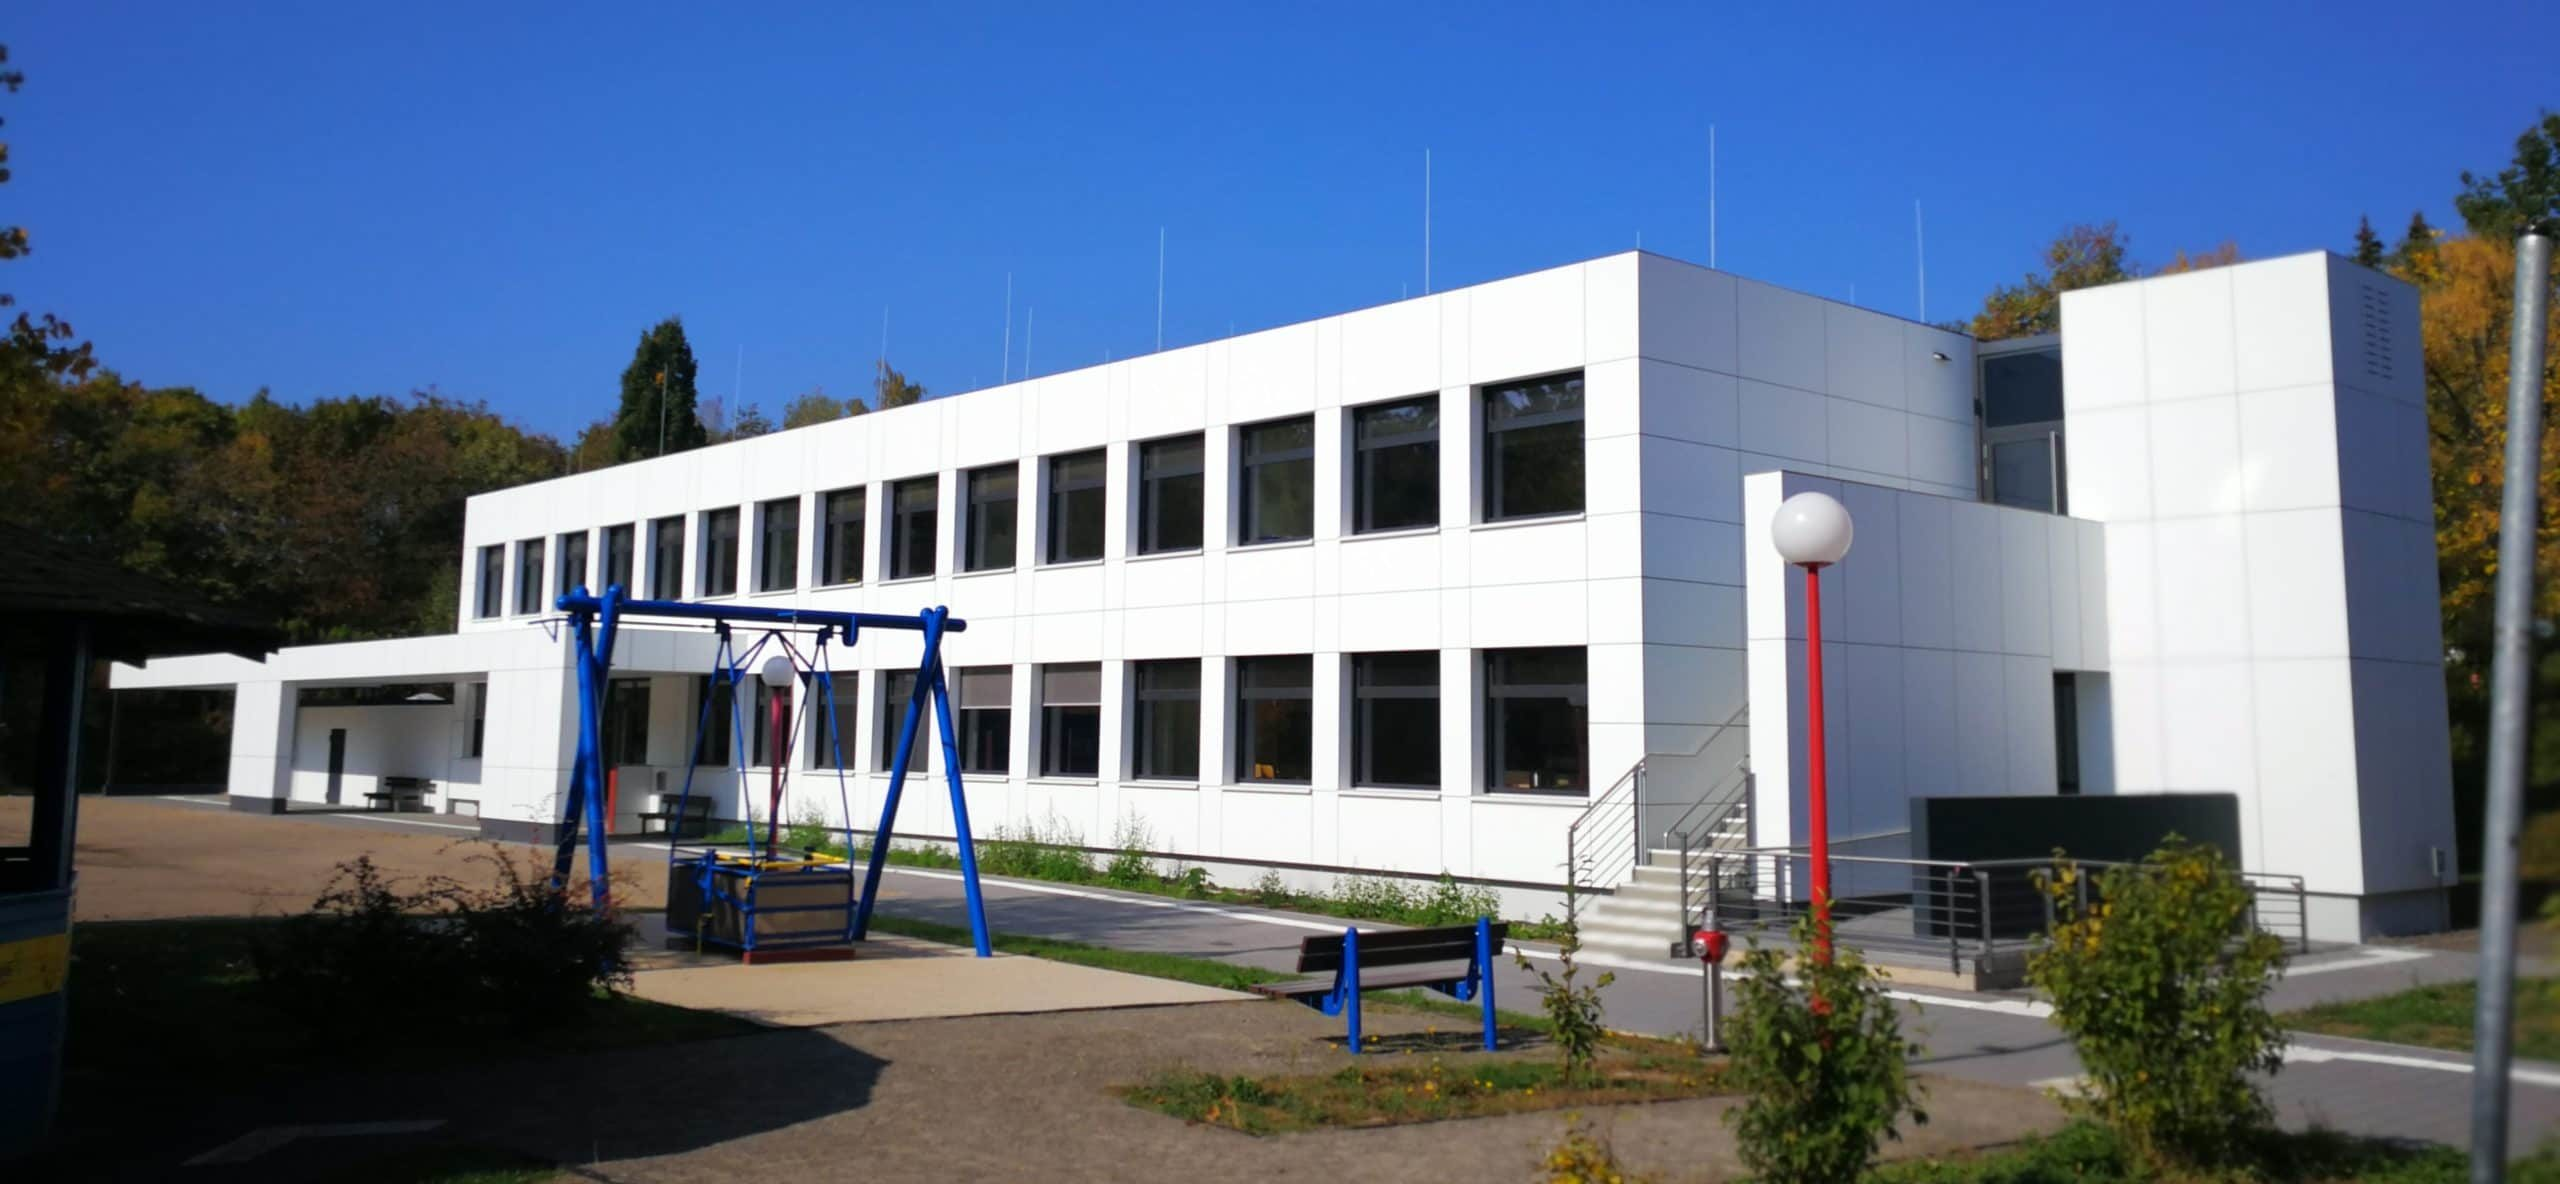 <b> Louis-Braille-Schule - Lebach </b>